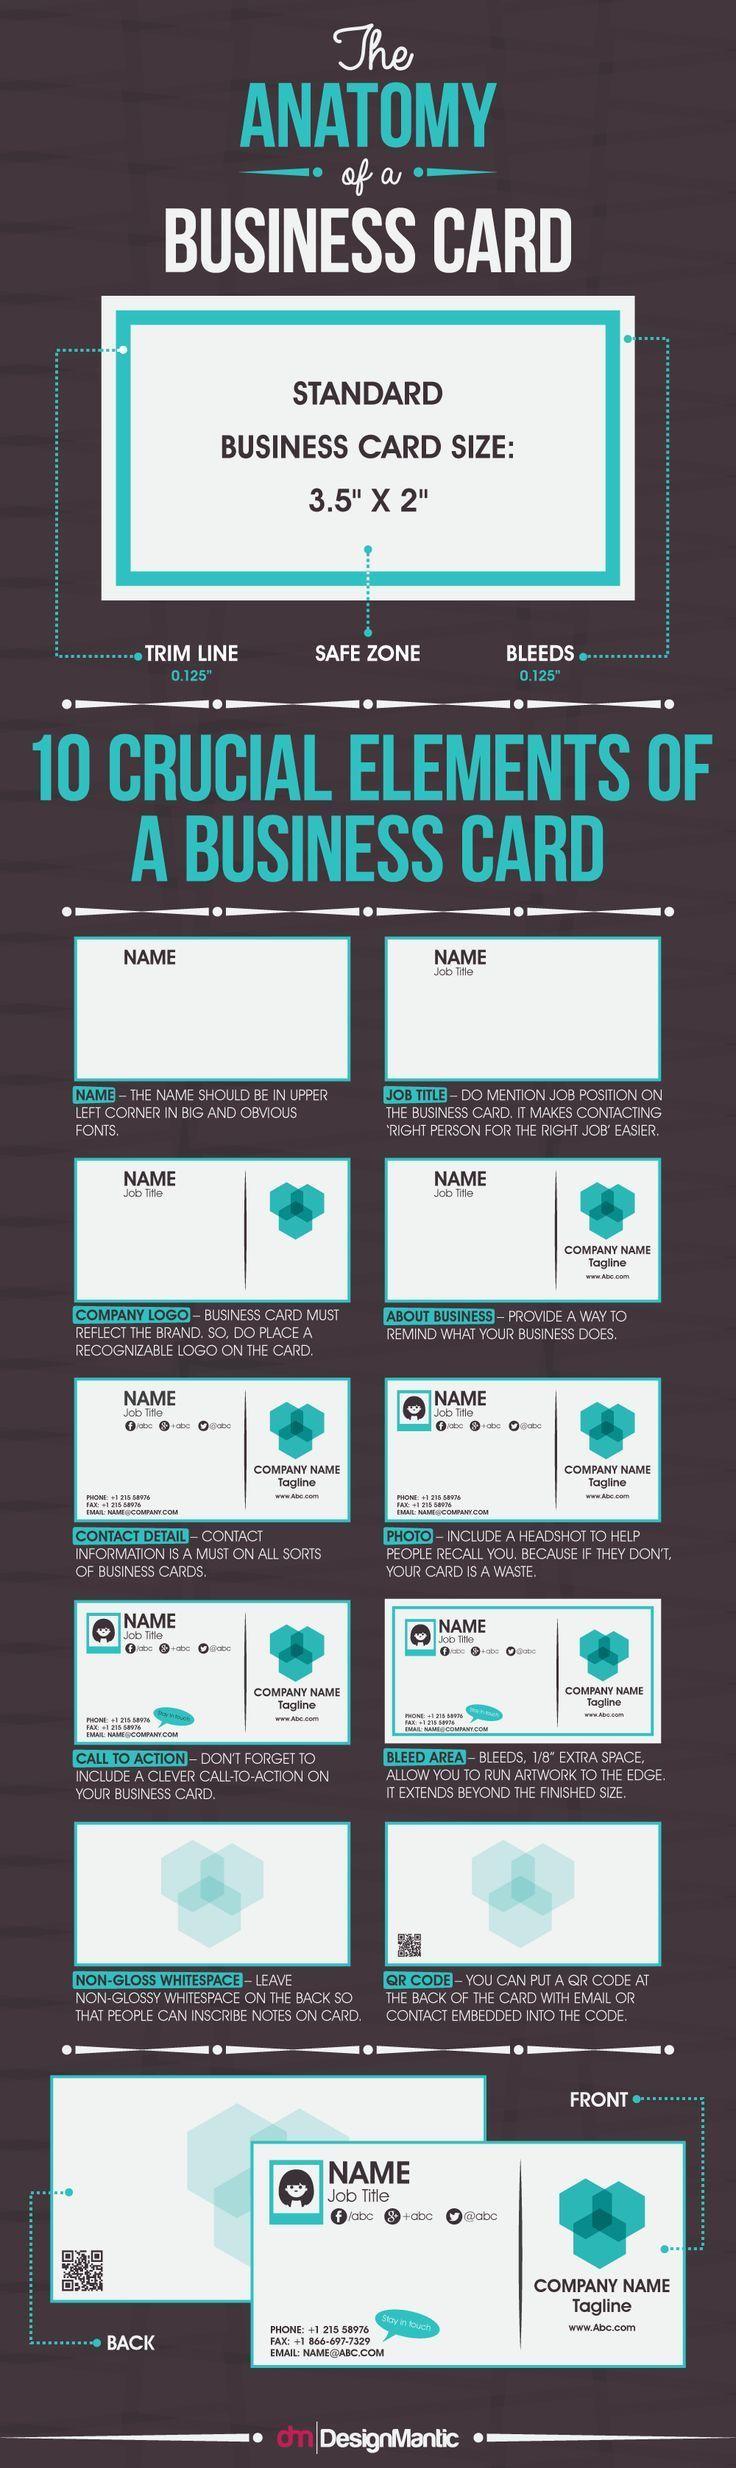 Best 25+ Free business card maker ideas on Pinterest | Free ...